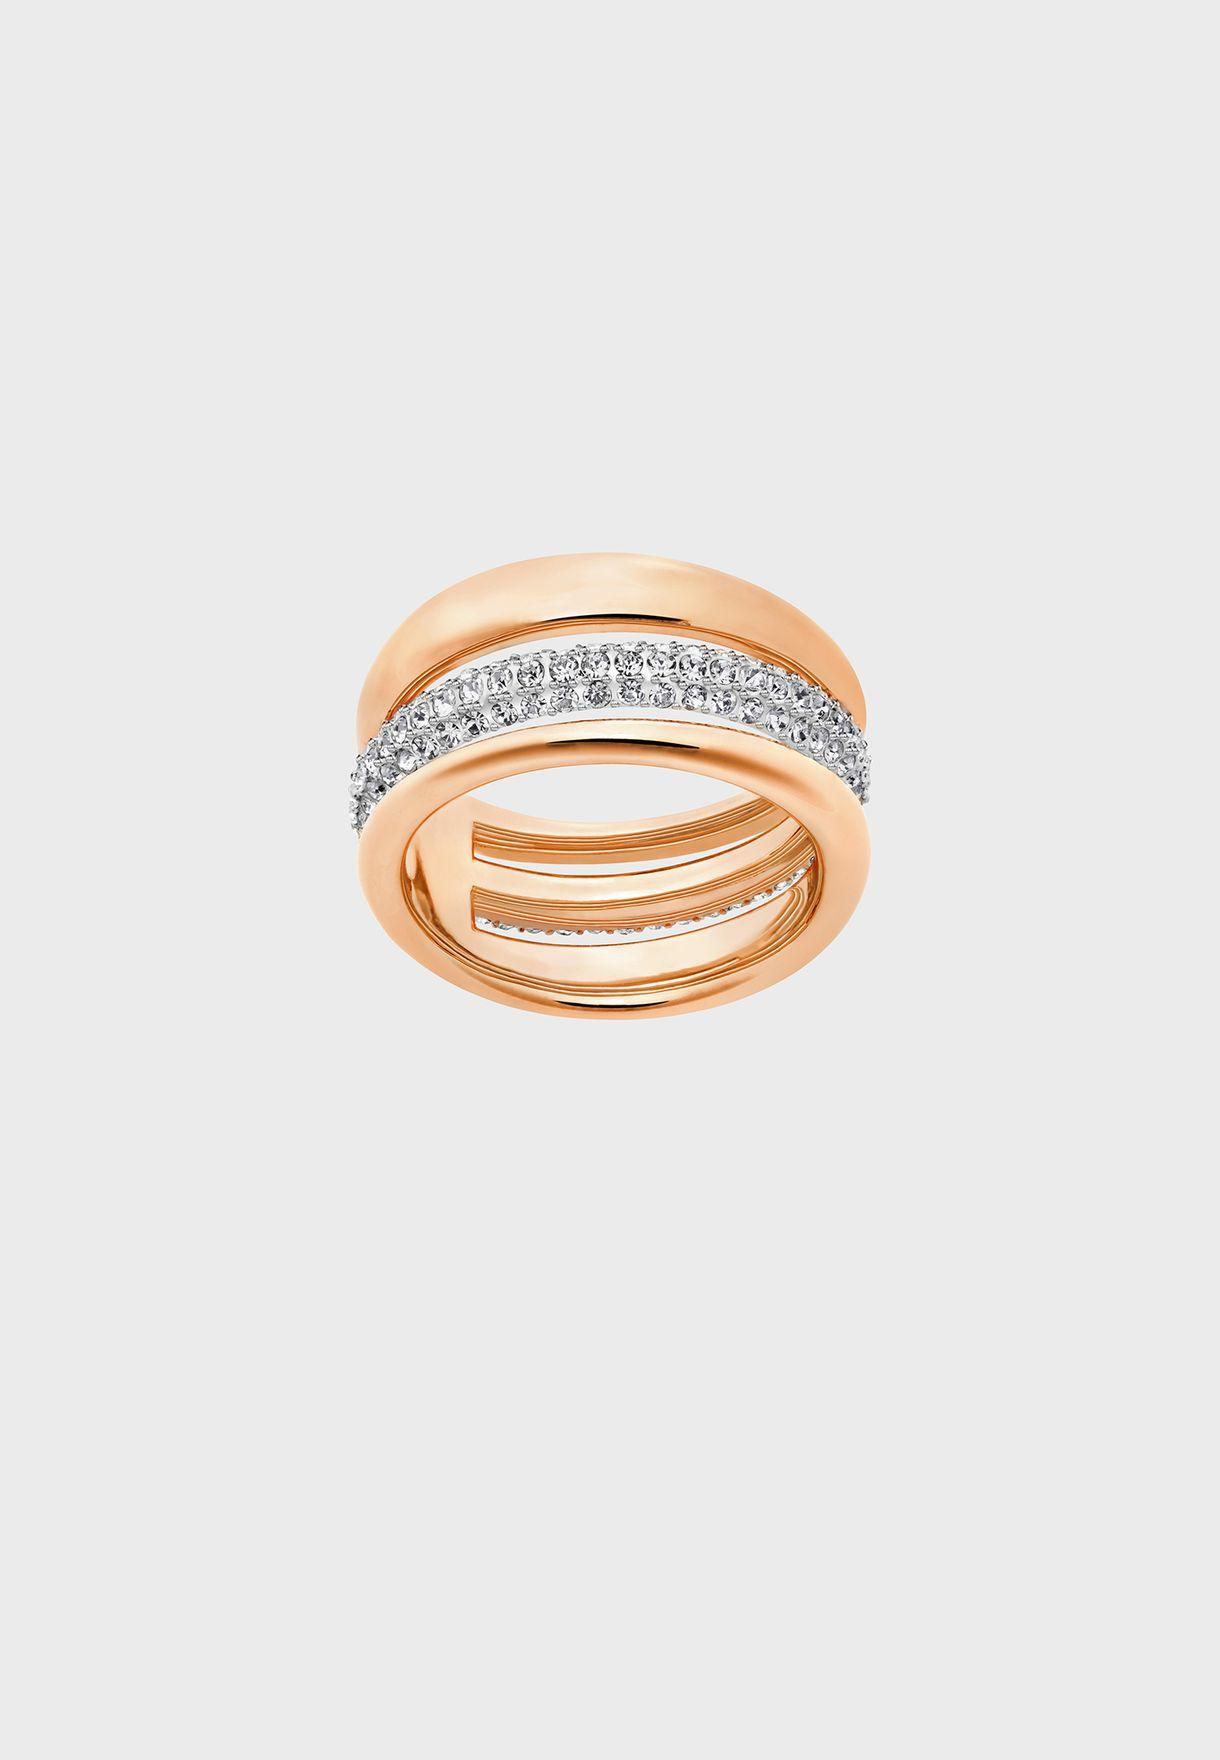 Exact Ring